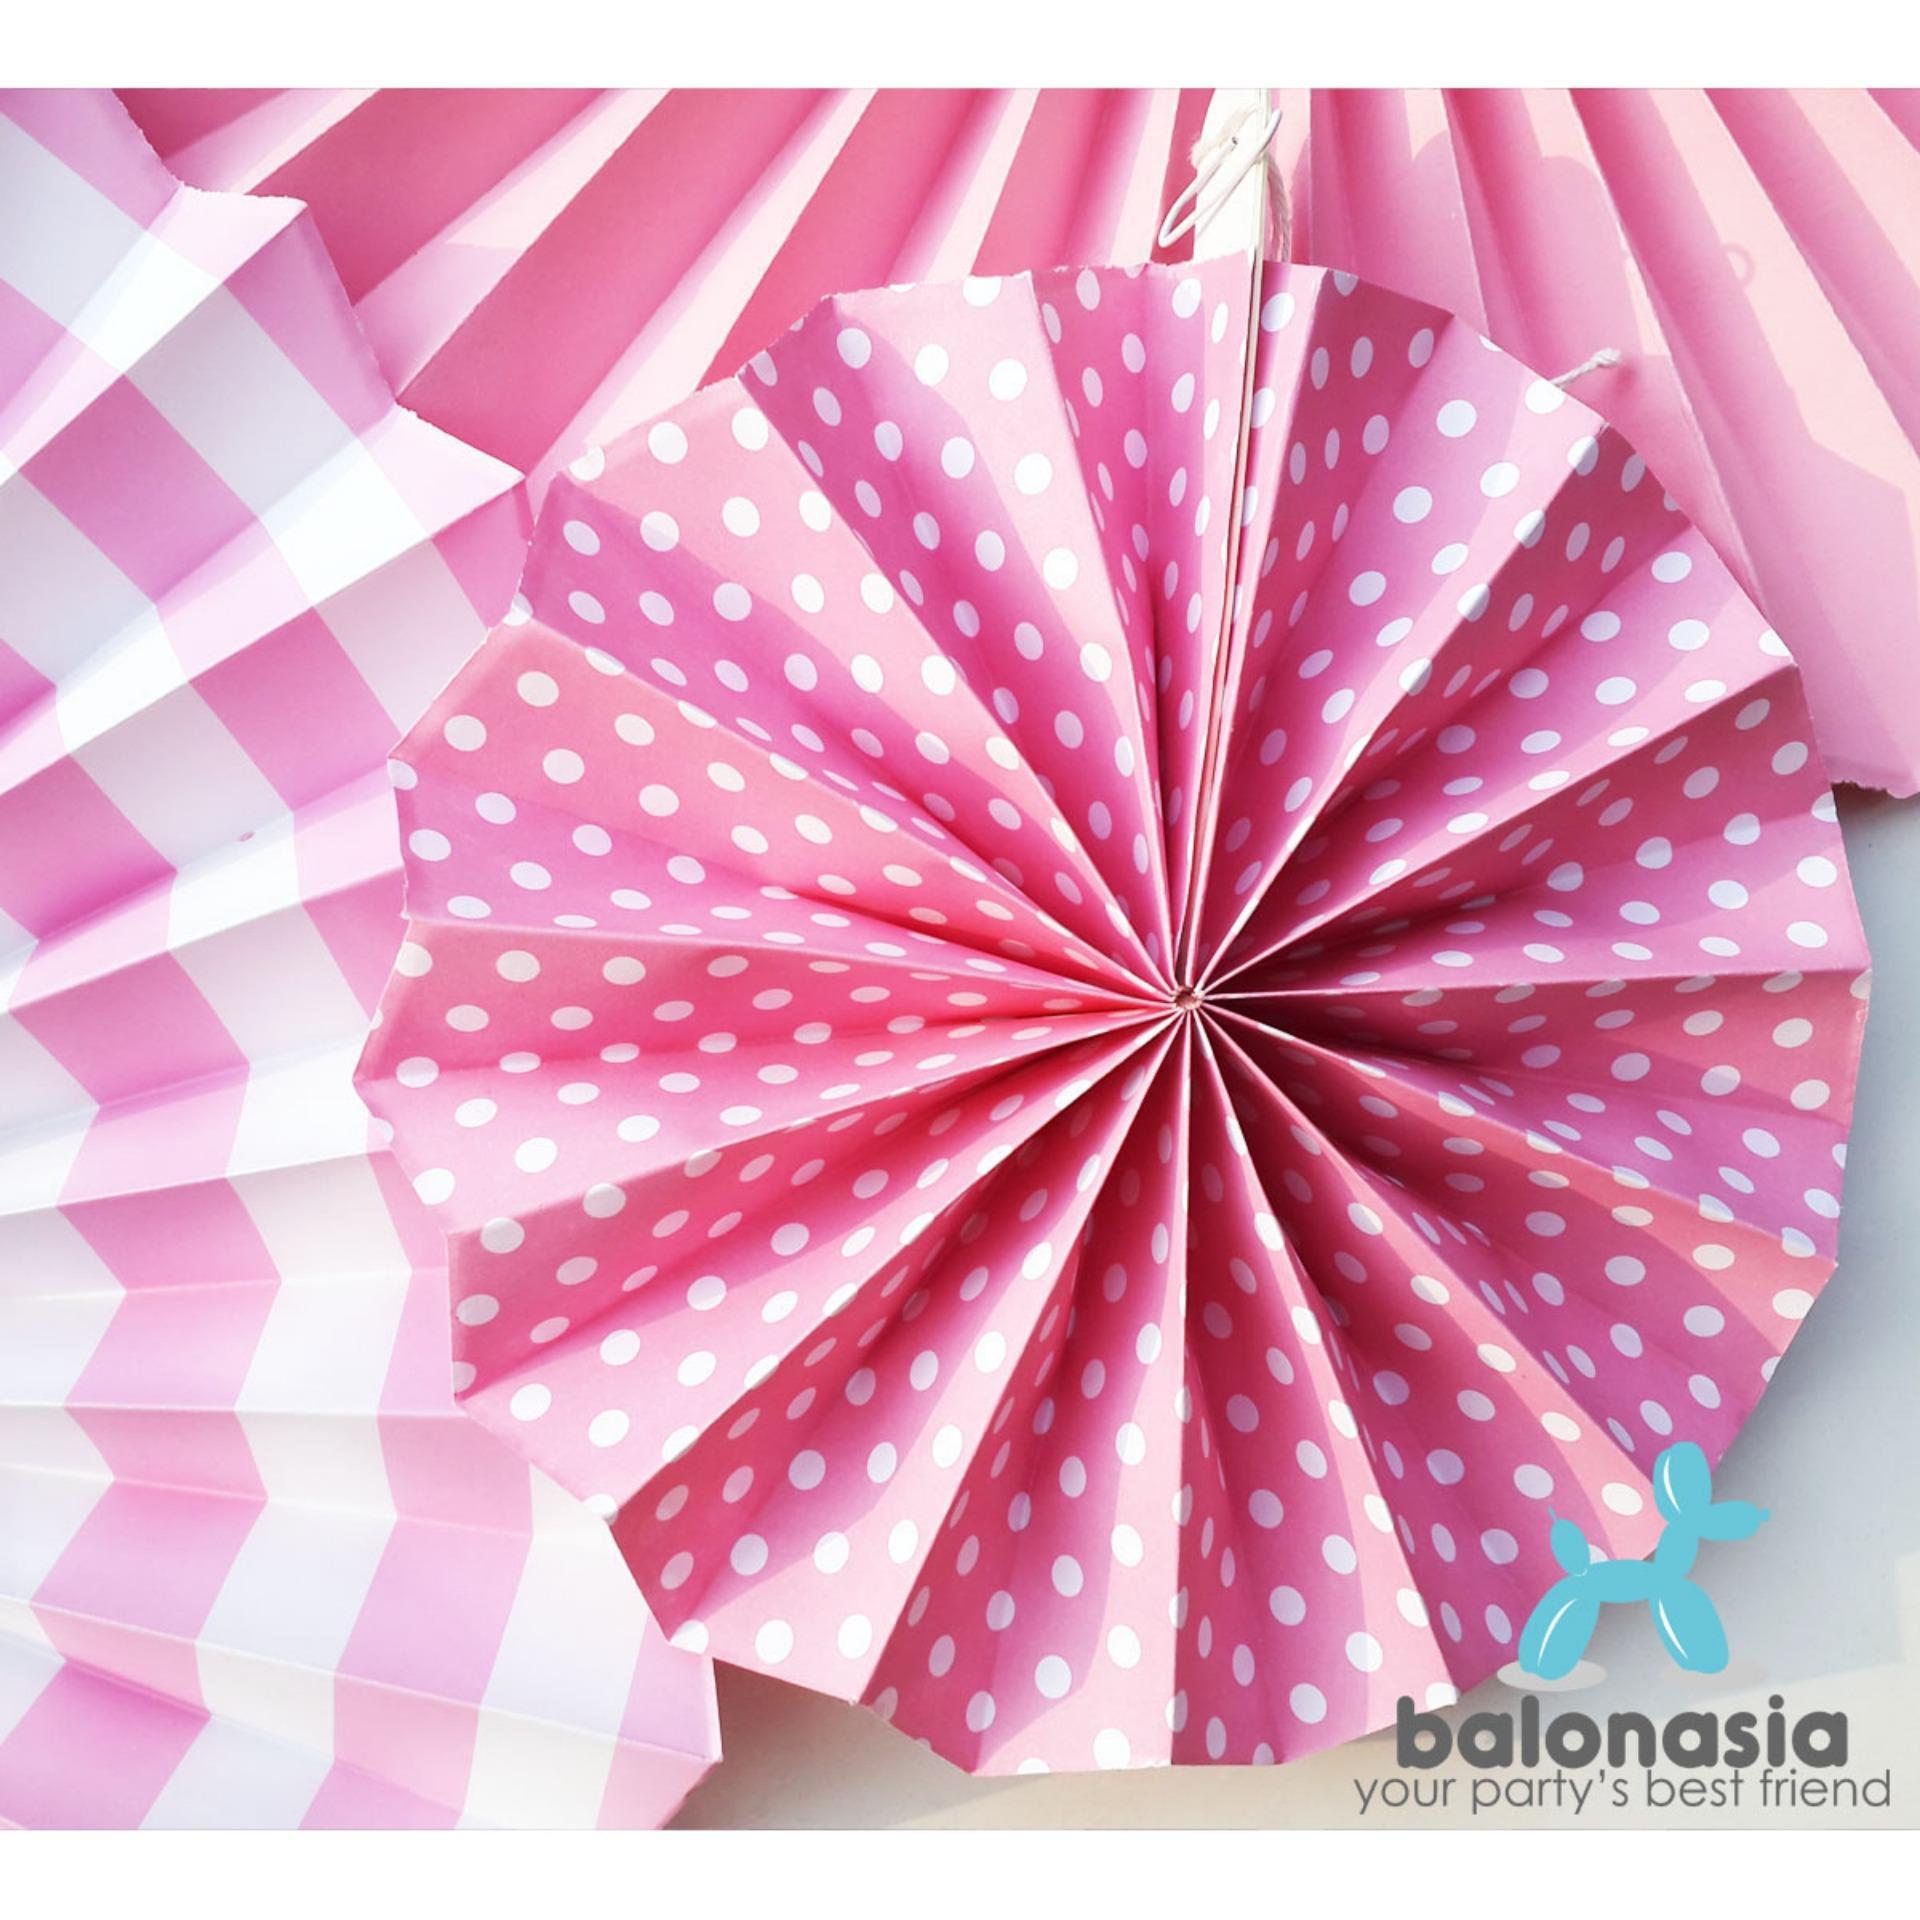 Balonasia 6 Pcs Lot Bunga Kertas Fan Tissue Kerajinan Dekorasi Backdrop Set Ulang Tahun Garis Polkadot Dekorasipernikahan Pesta Home